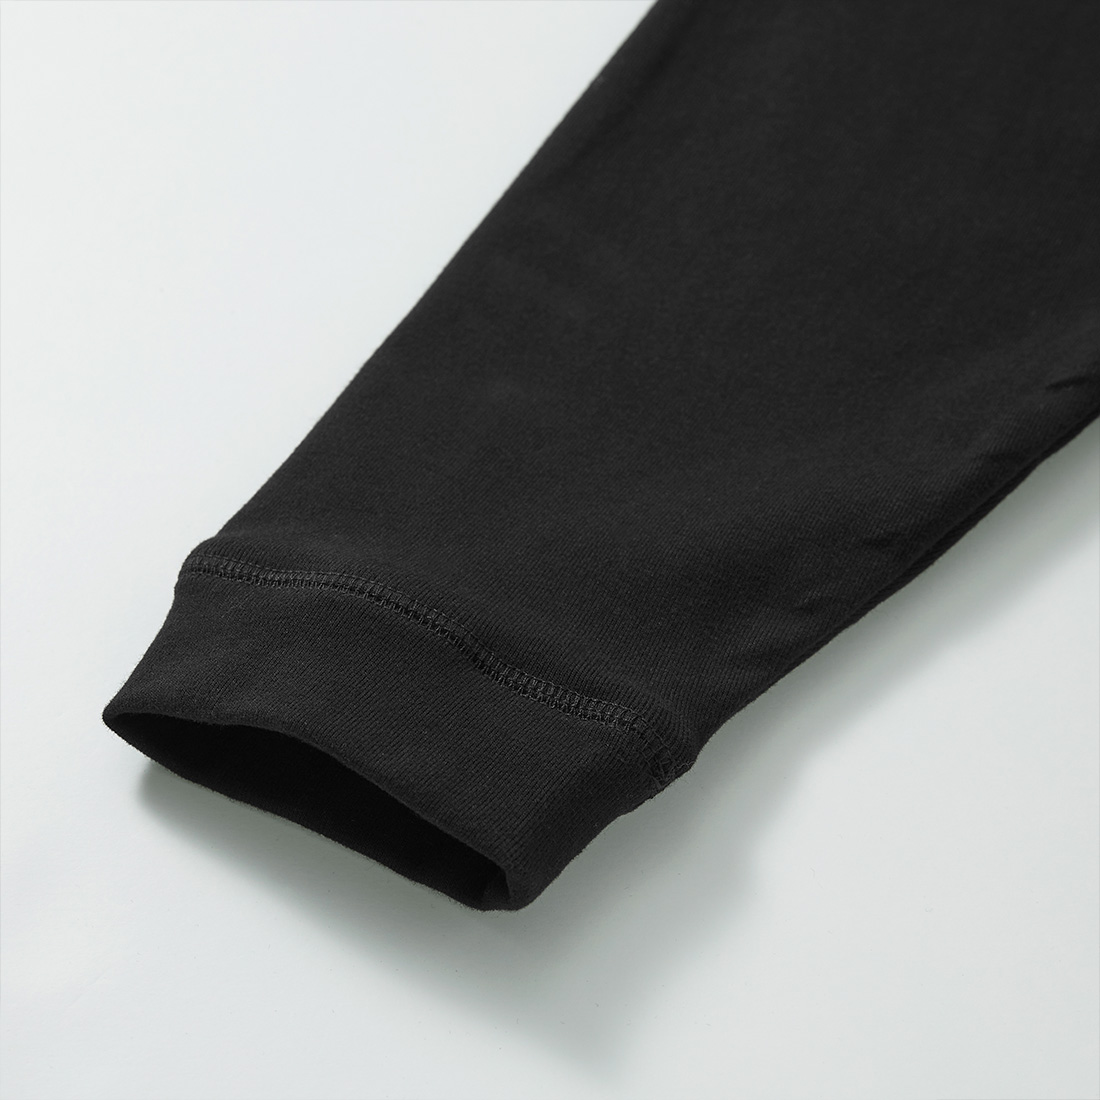 time less drop cardiganの商品写真4